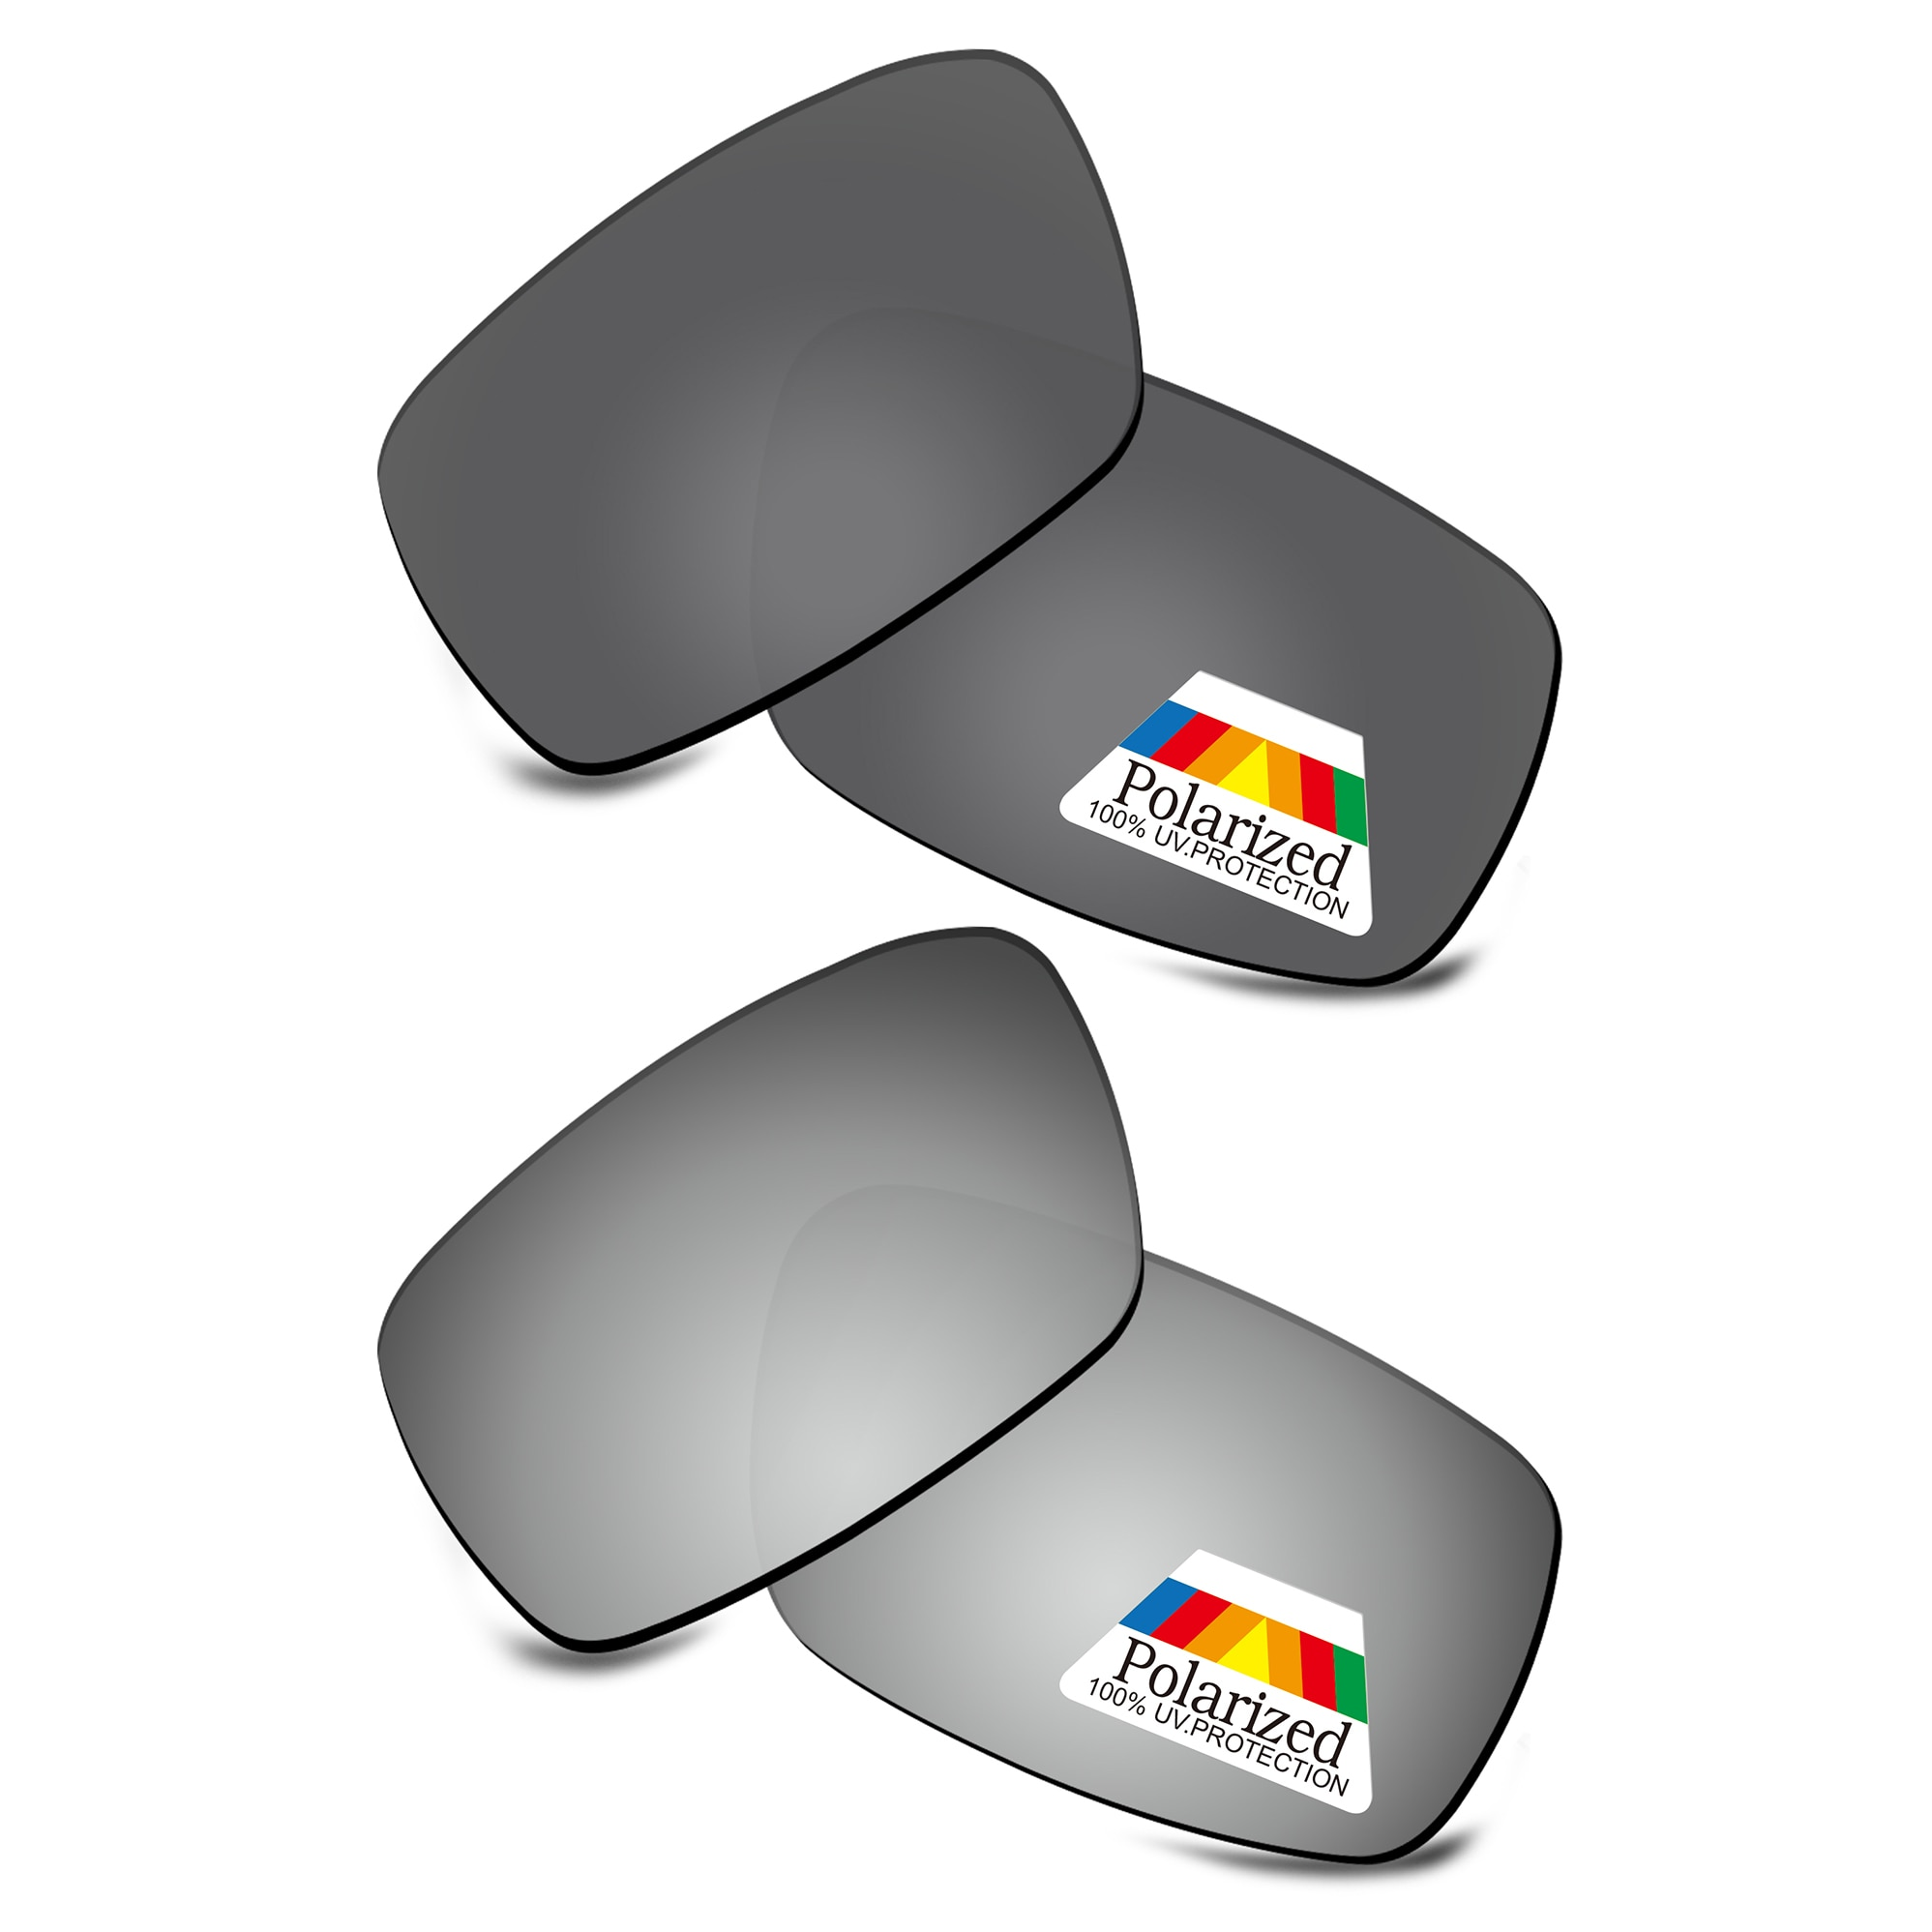 Фото - Bwake 2 Pairs Black & Silver Polarized Replacement Lenses for-Oakley Crankshaft OO9239 Sunglasses Frame очки oakley oakley c 3 crankshaft черный onesize